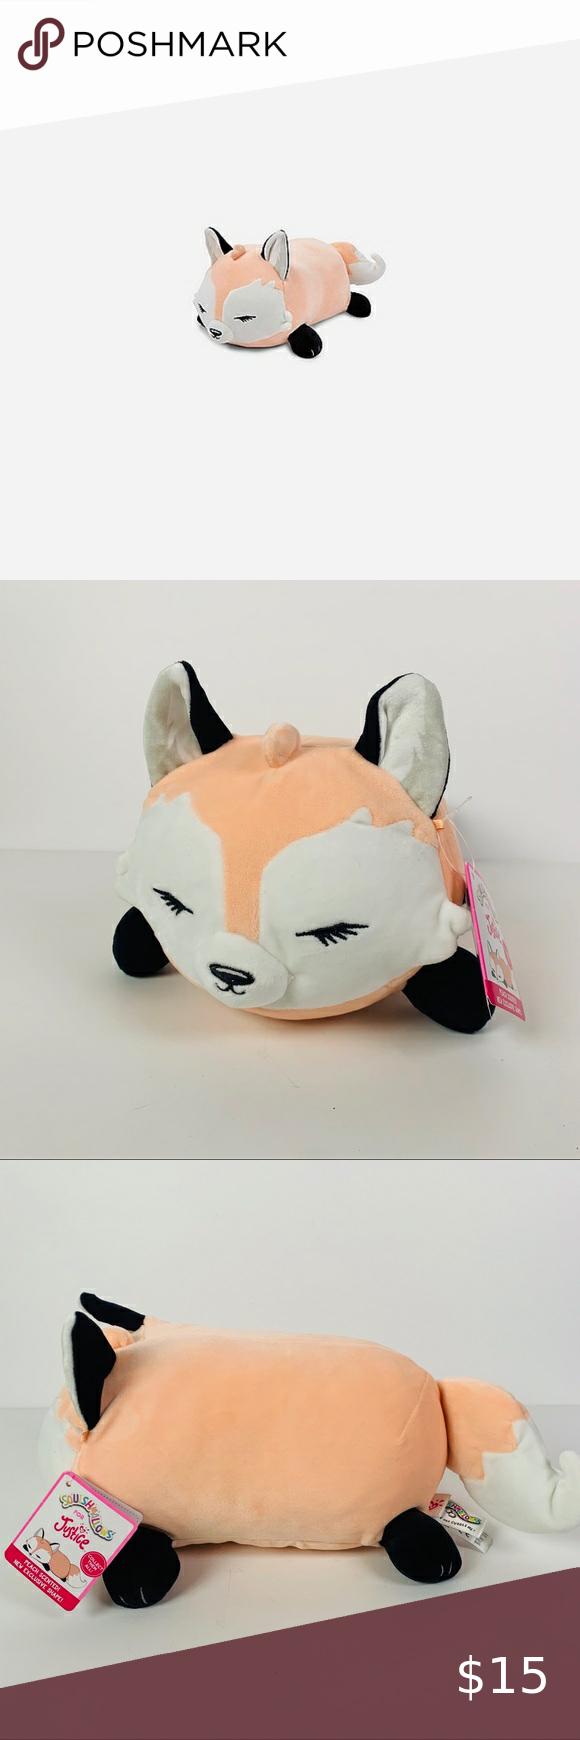 Justice Mini Squishmallow Quinn The Fox Peach Justice Toys Soft Plush Pet Toys